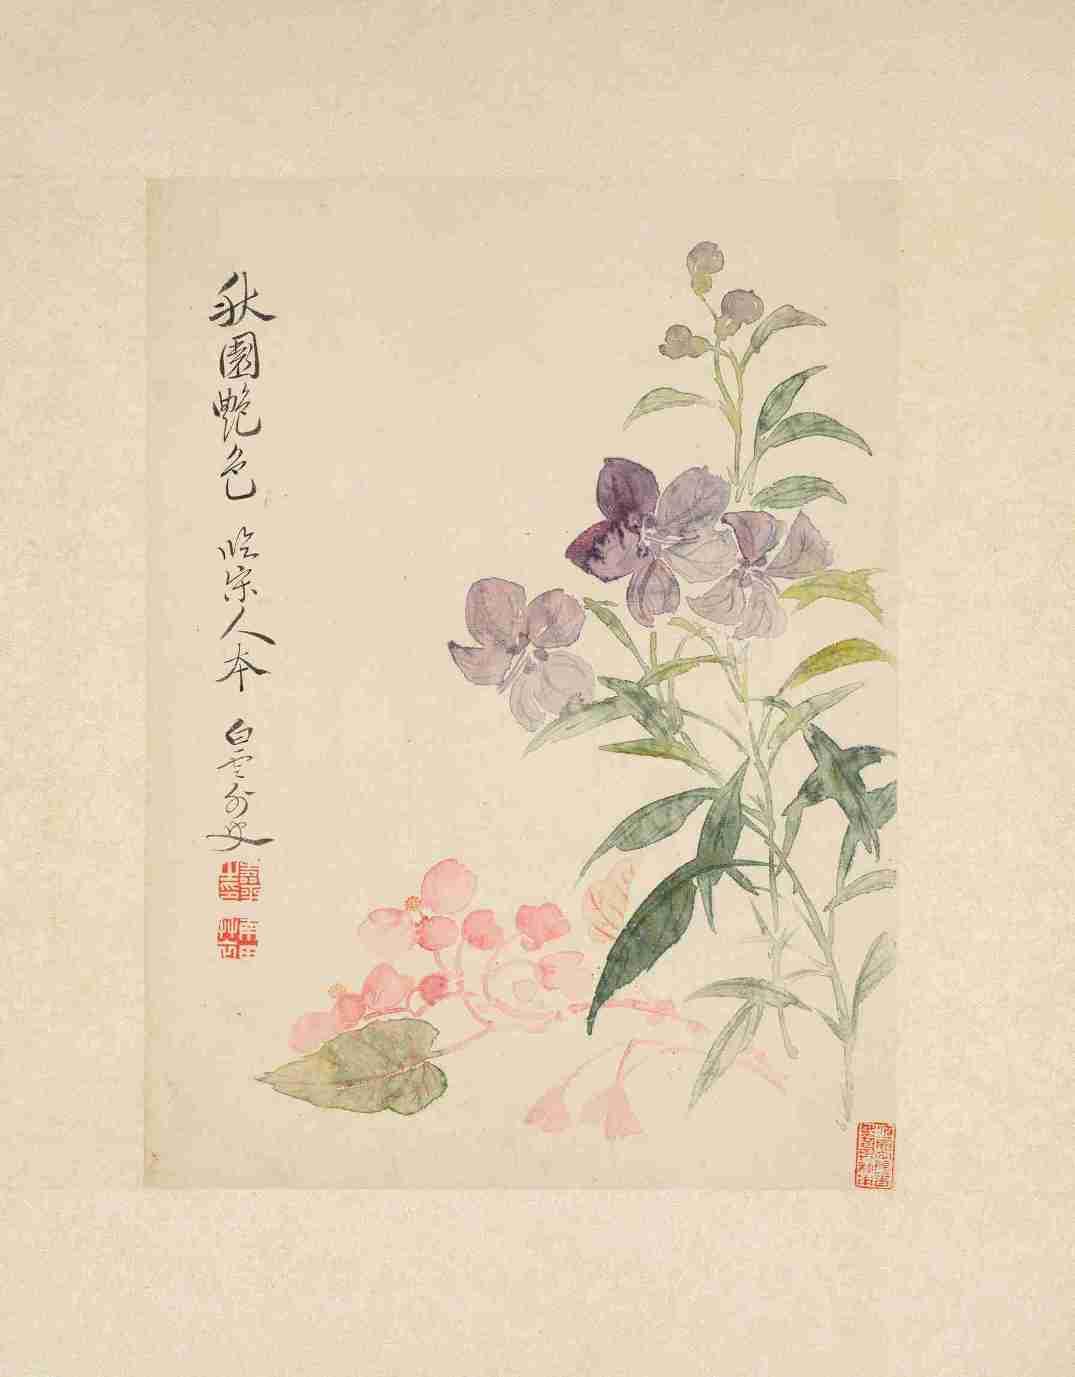 Autumn flowers-YunShouping (R).jpg